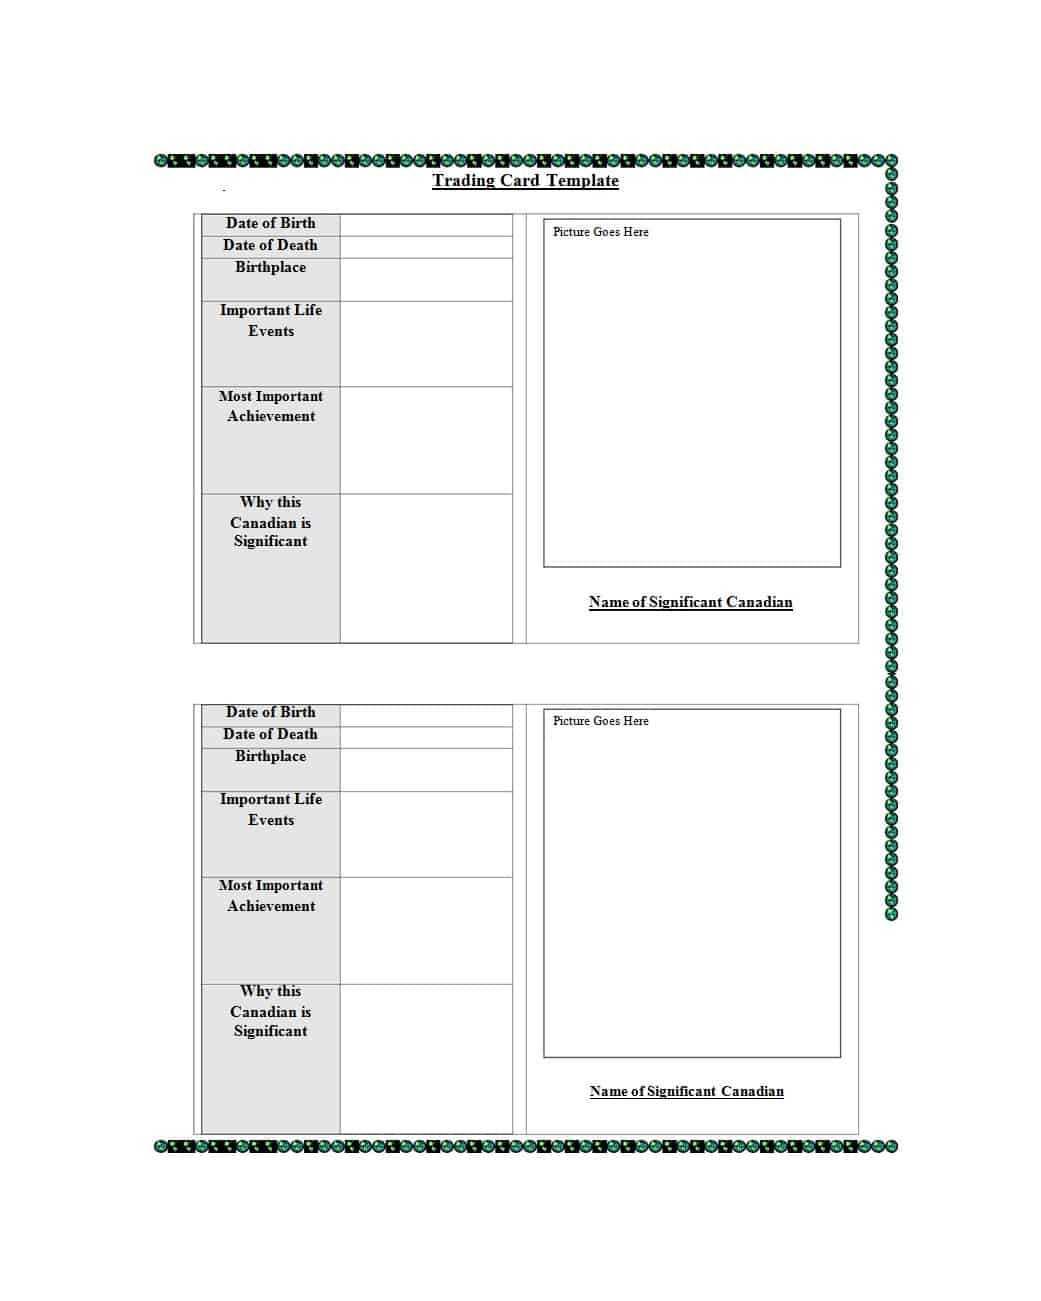 33 Free Trading Card Templates (Baseball, Football, Etc With Free Trading Card Template Download